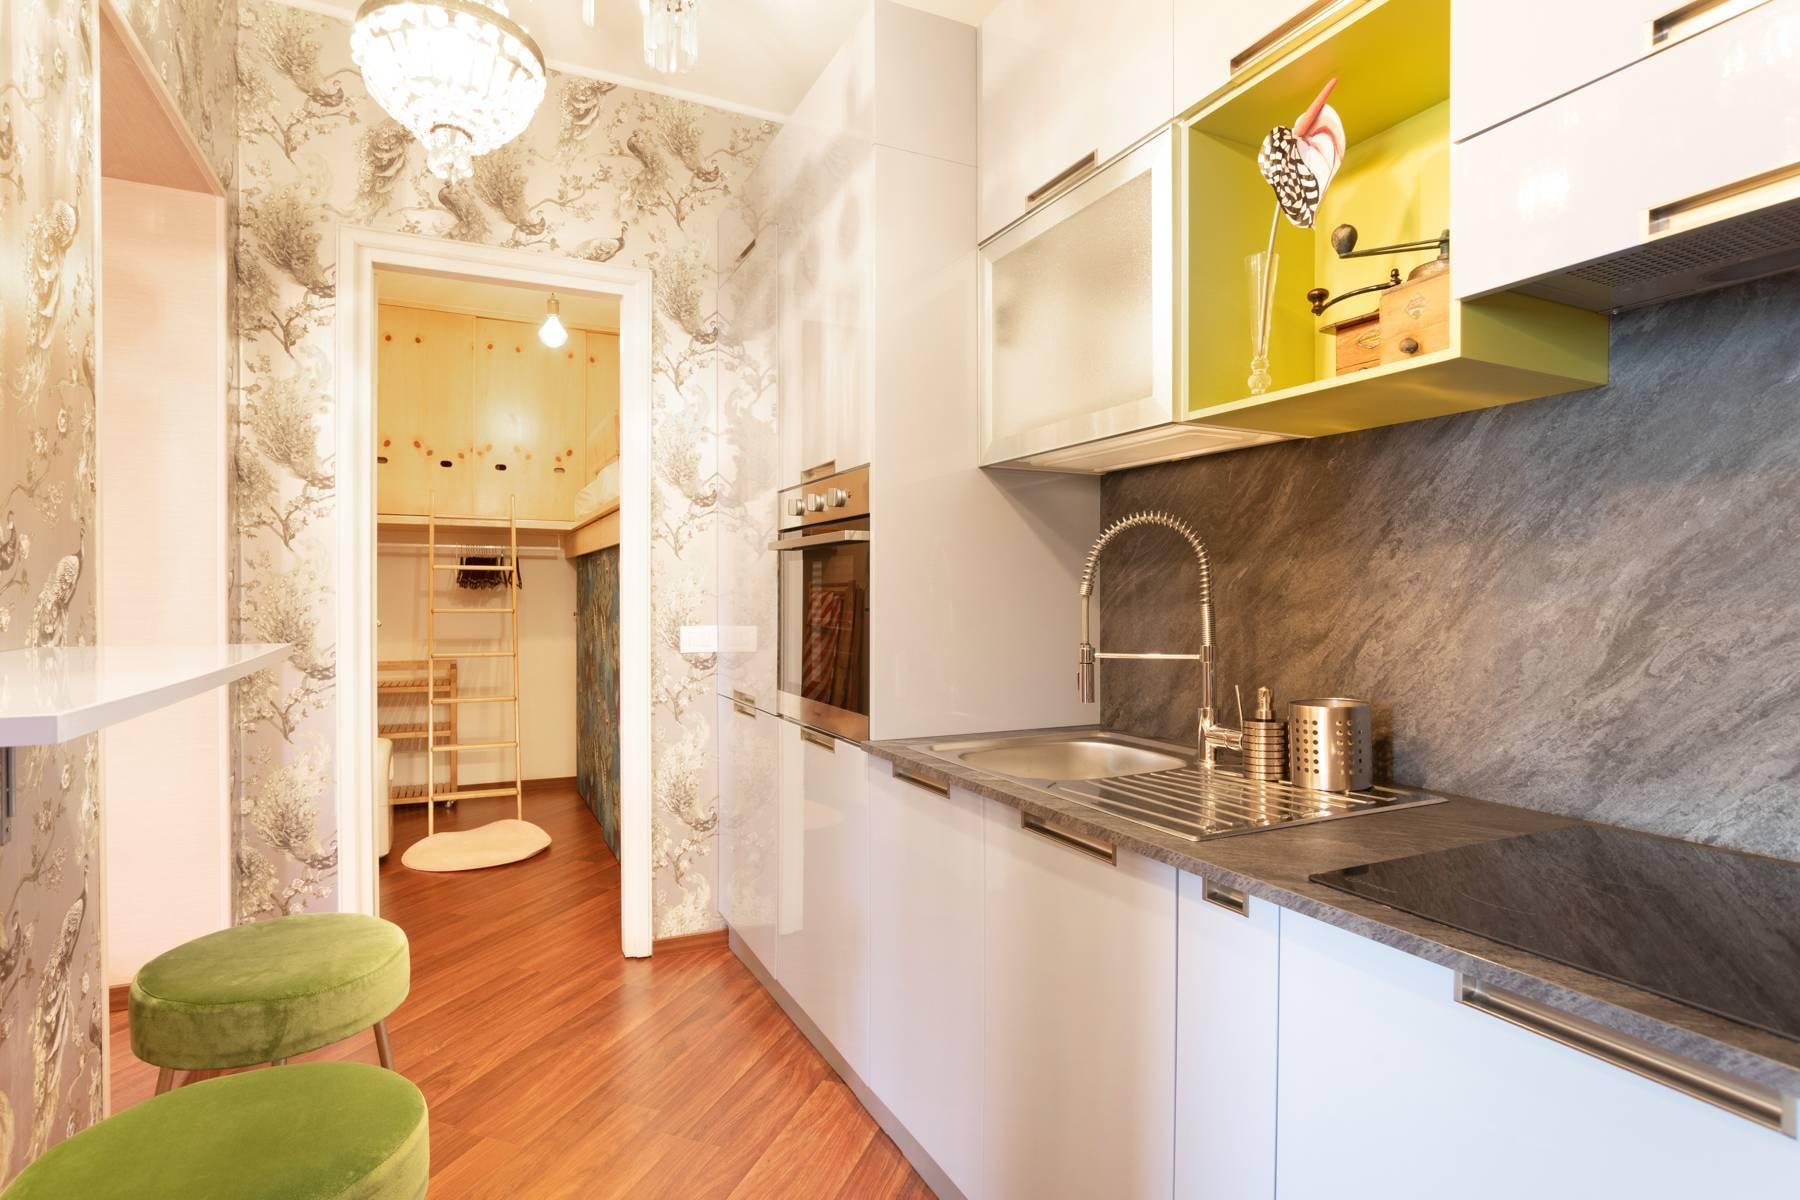 Elegant apartment in the small hamlet of Belgirate - 8